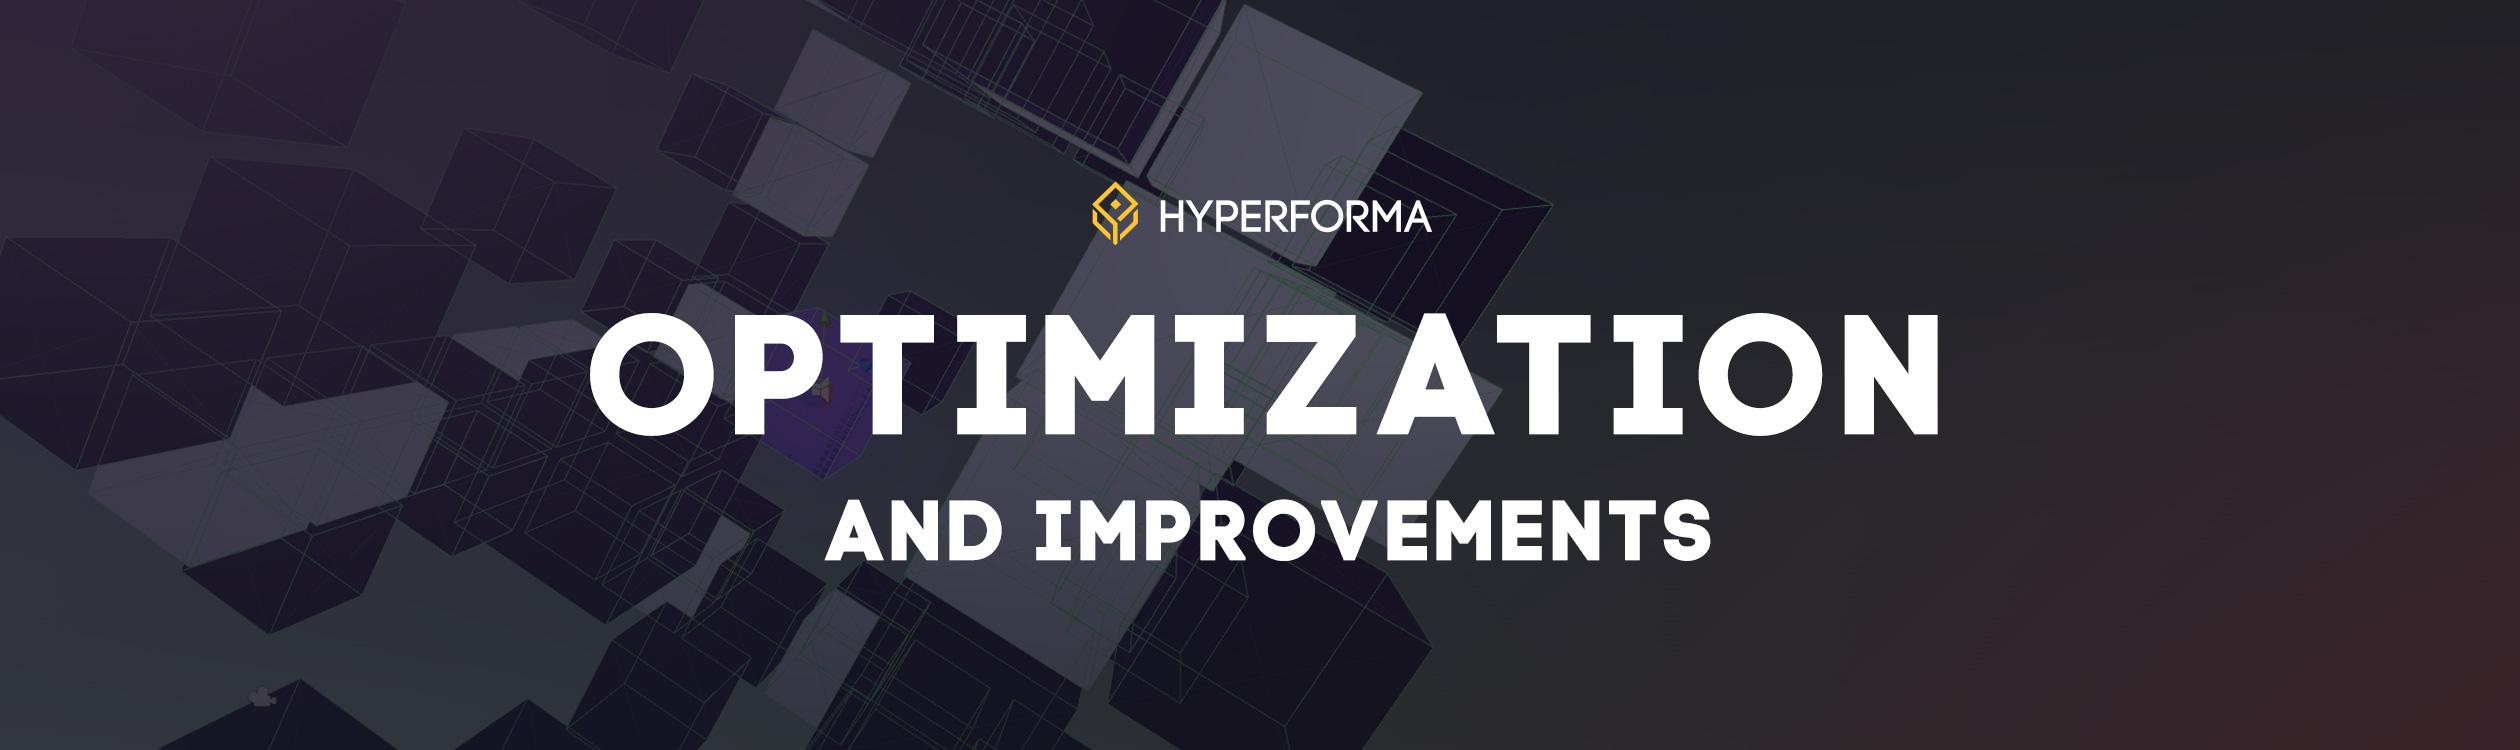 fface_optimization